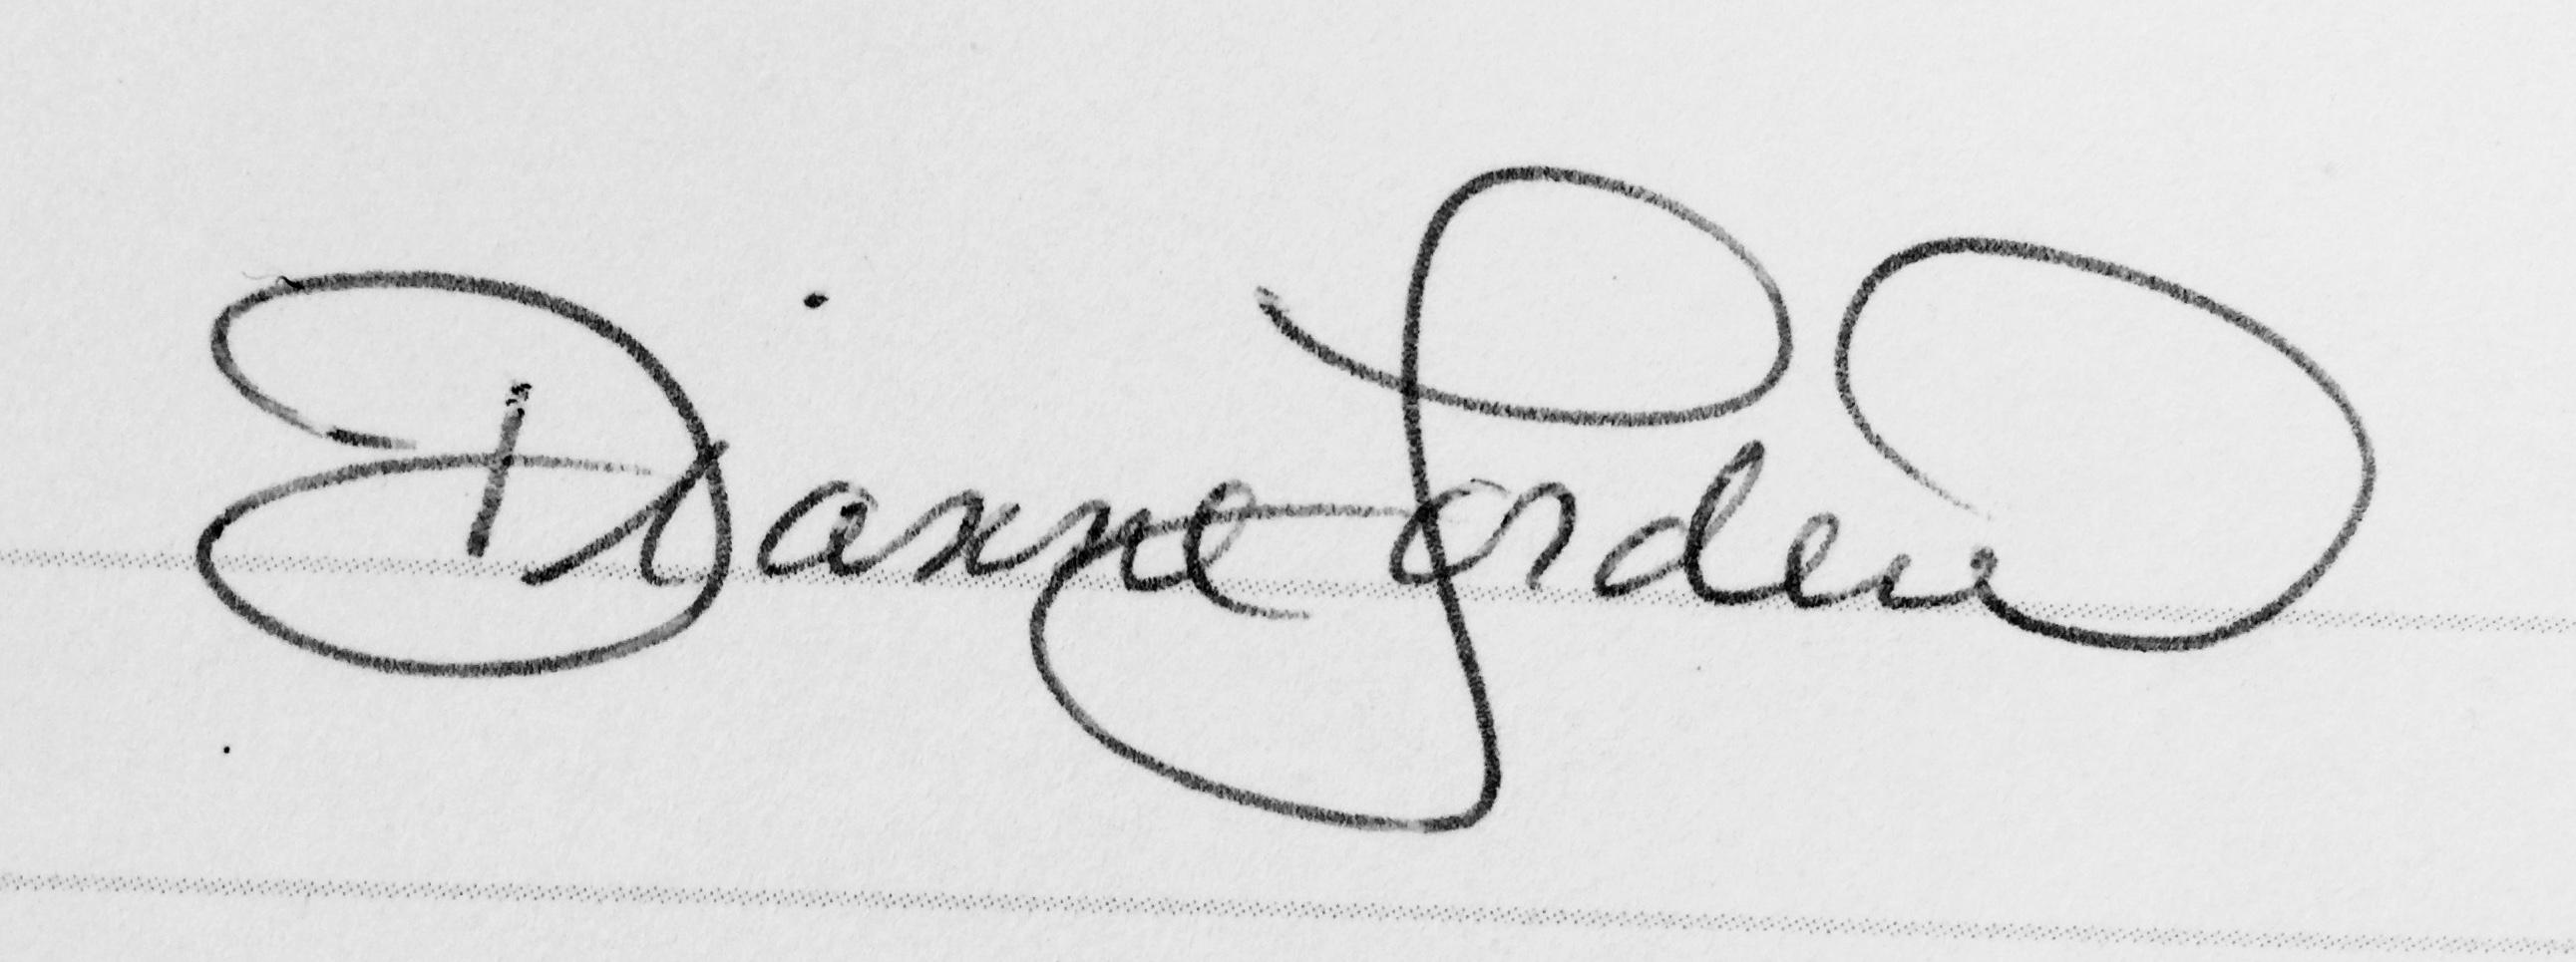 Dianne Lorden's Signature